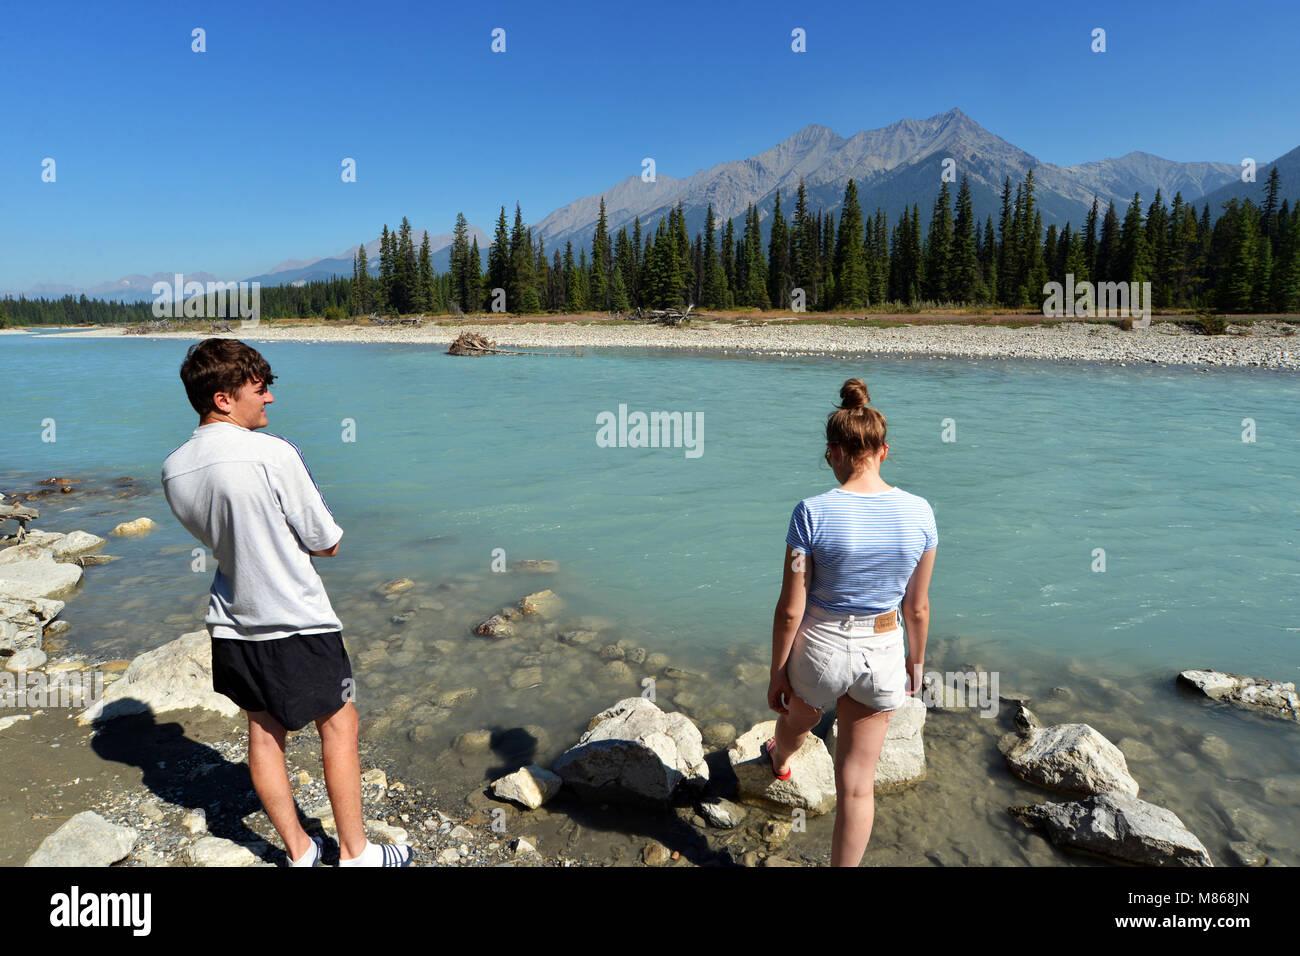 Kootenay River, Kootenay National Park, British Columbia Canada. MODEL RELEASED - Stock Image